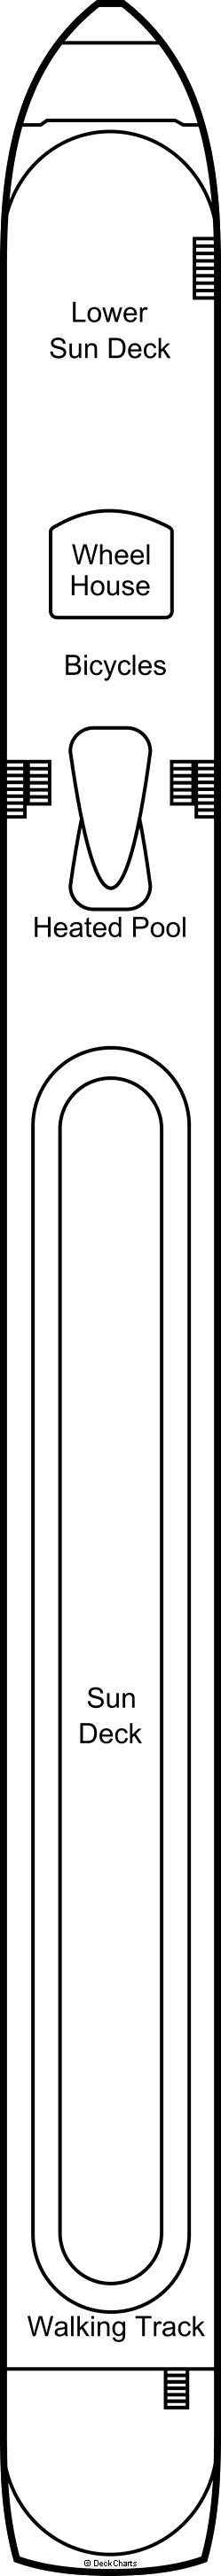 AmaViola: Sun Deck